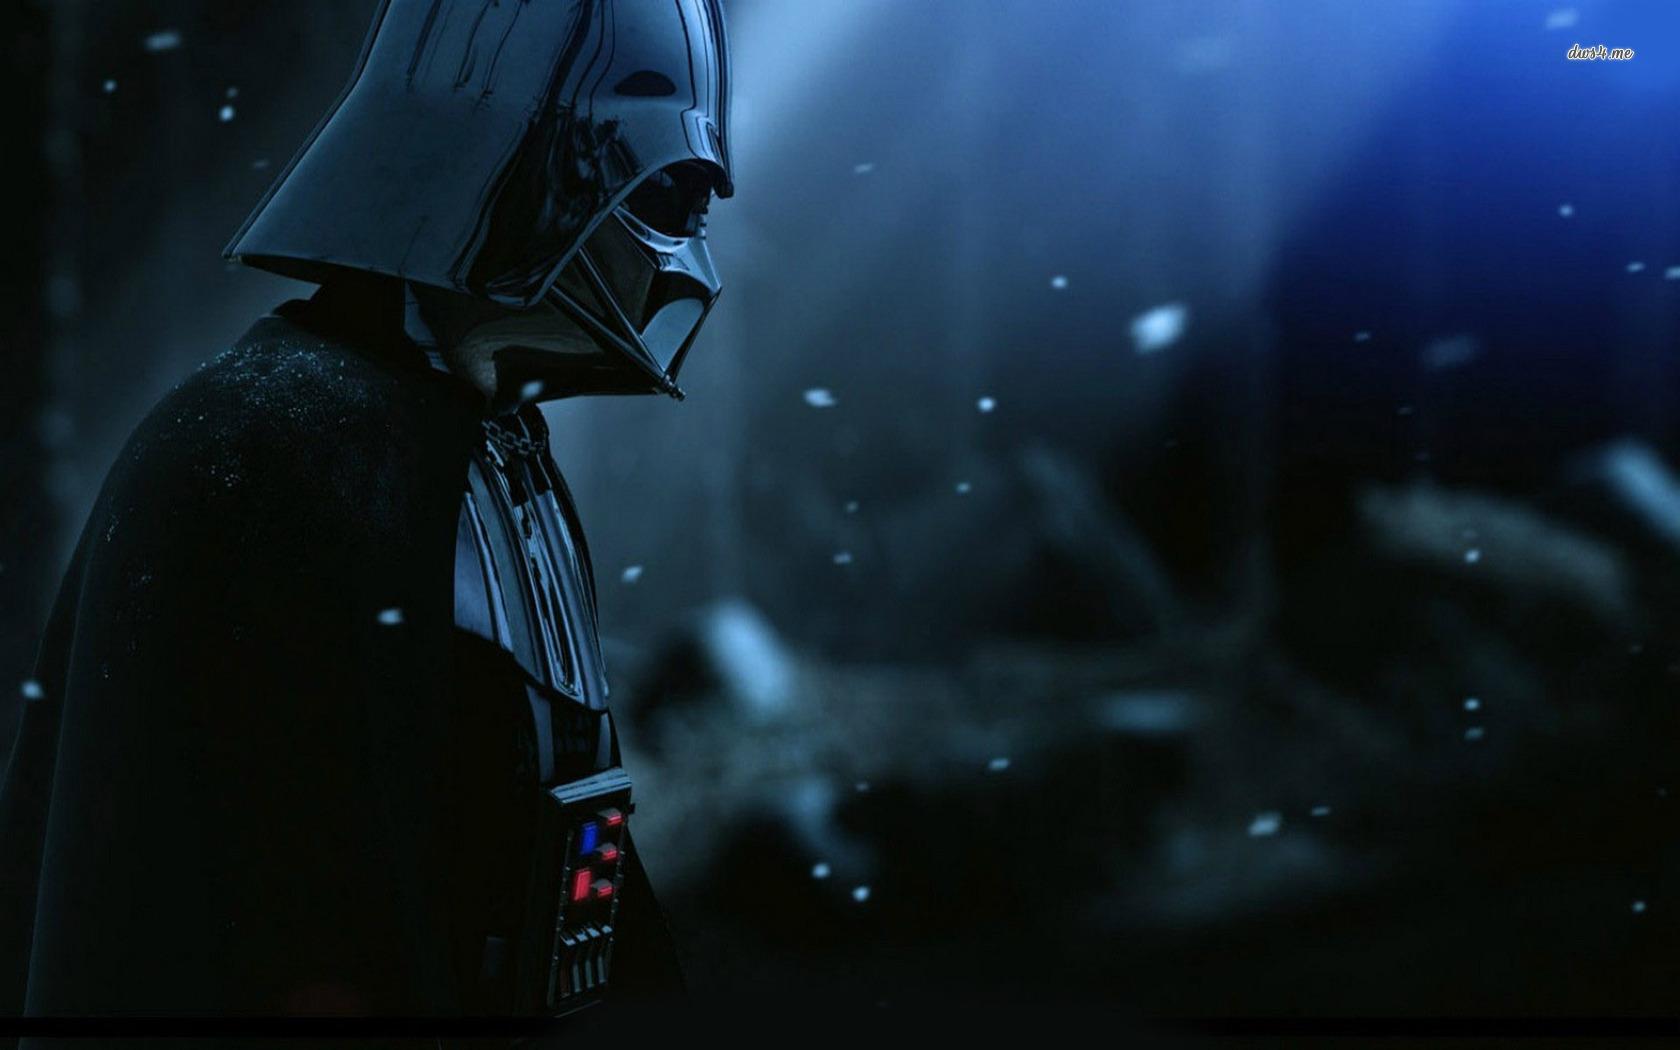 Darth Vader Wallpapers Hd Wallpapercraft 1680x1050